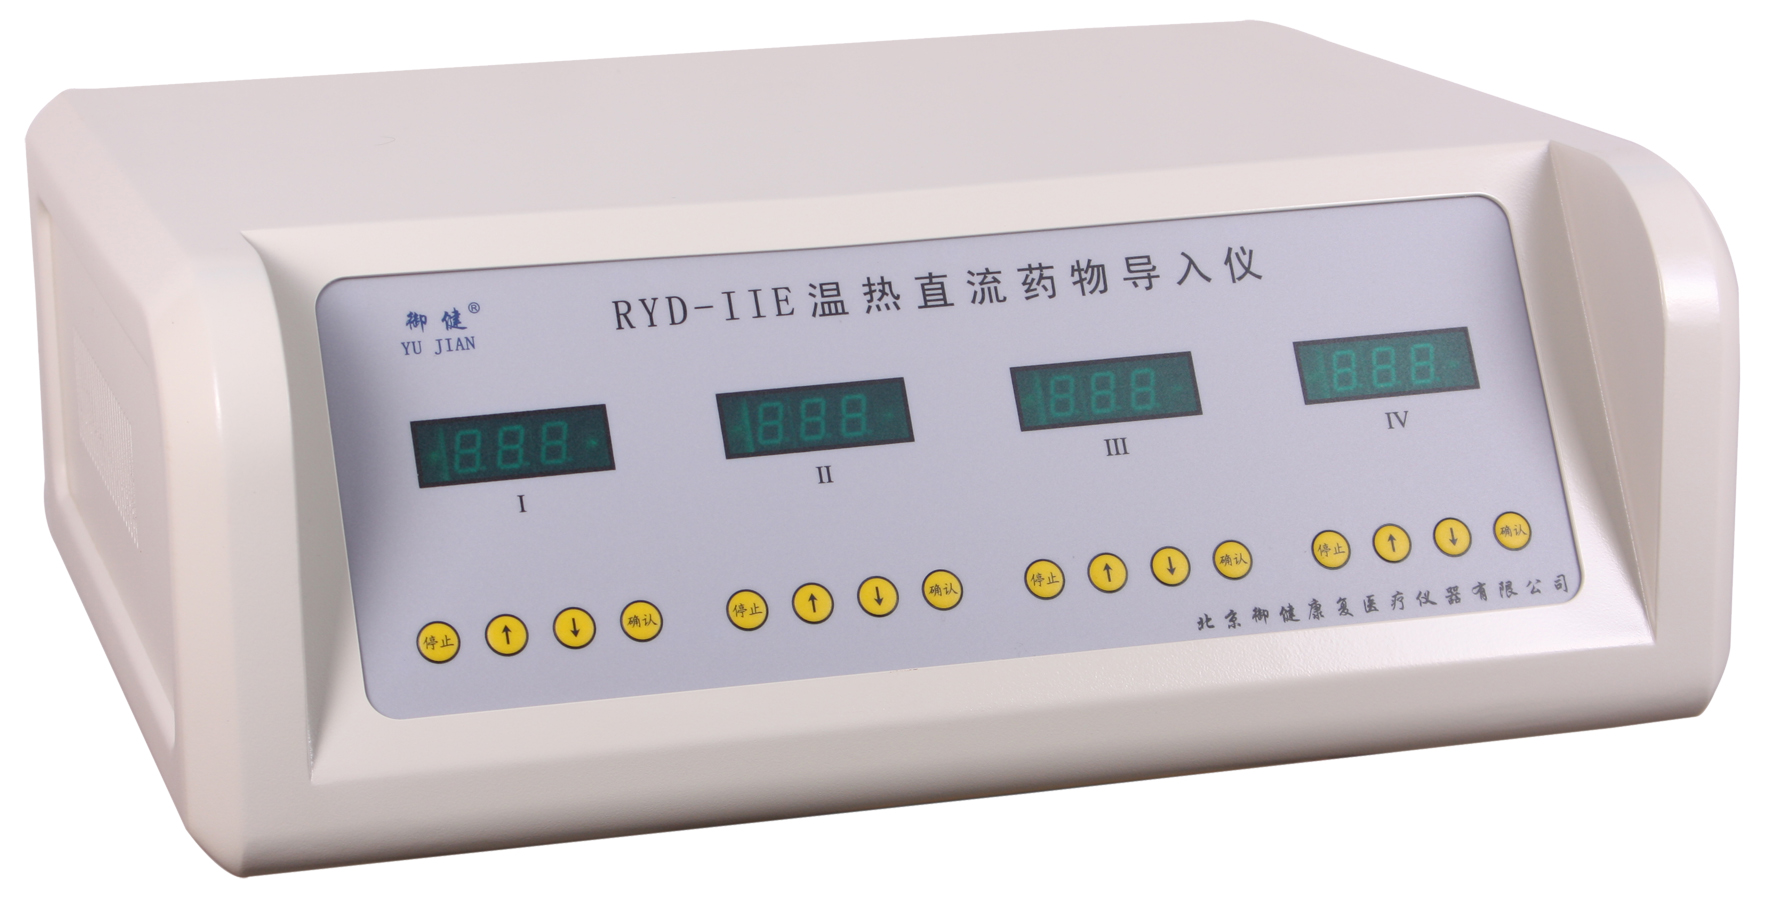 RYD-IIE型温热直流药物导入销售